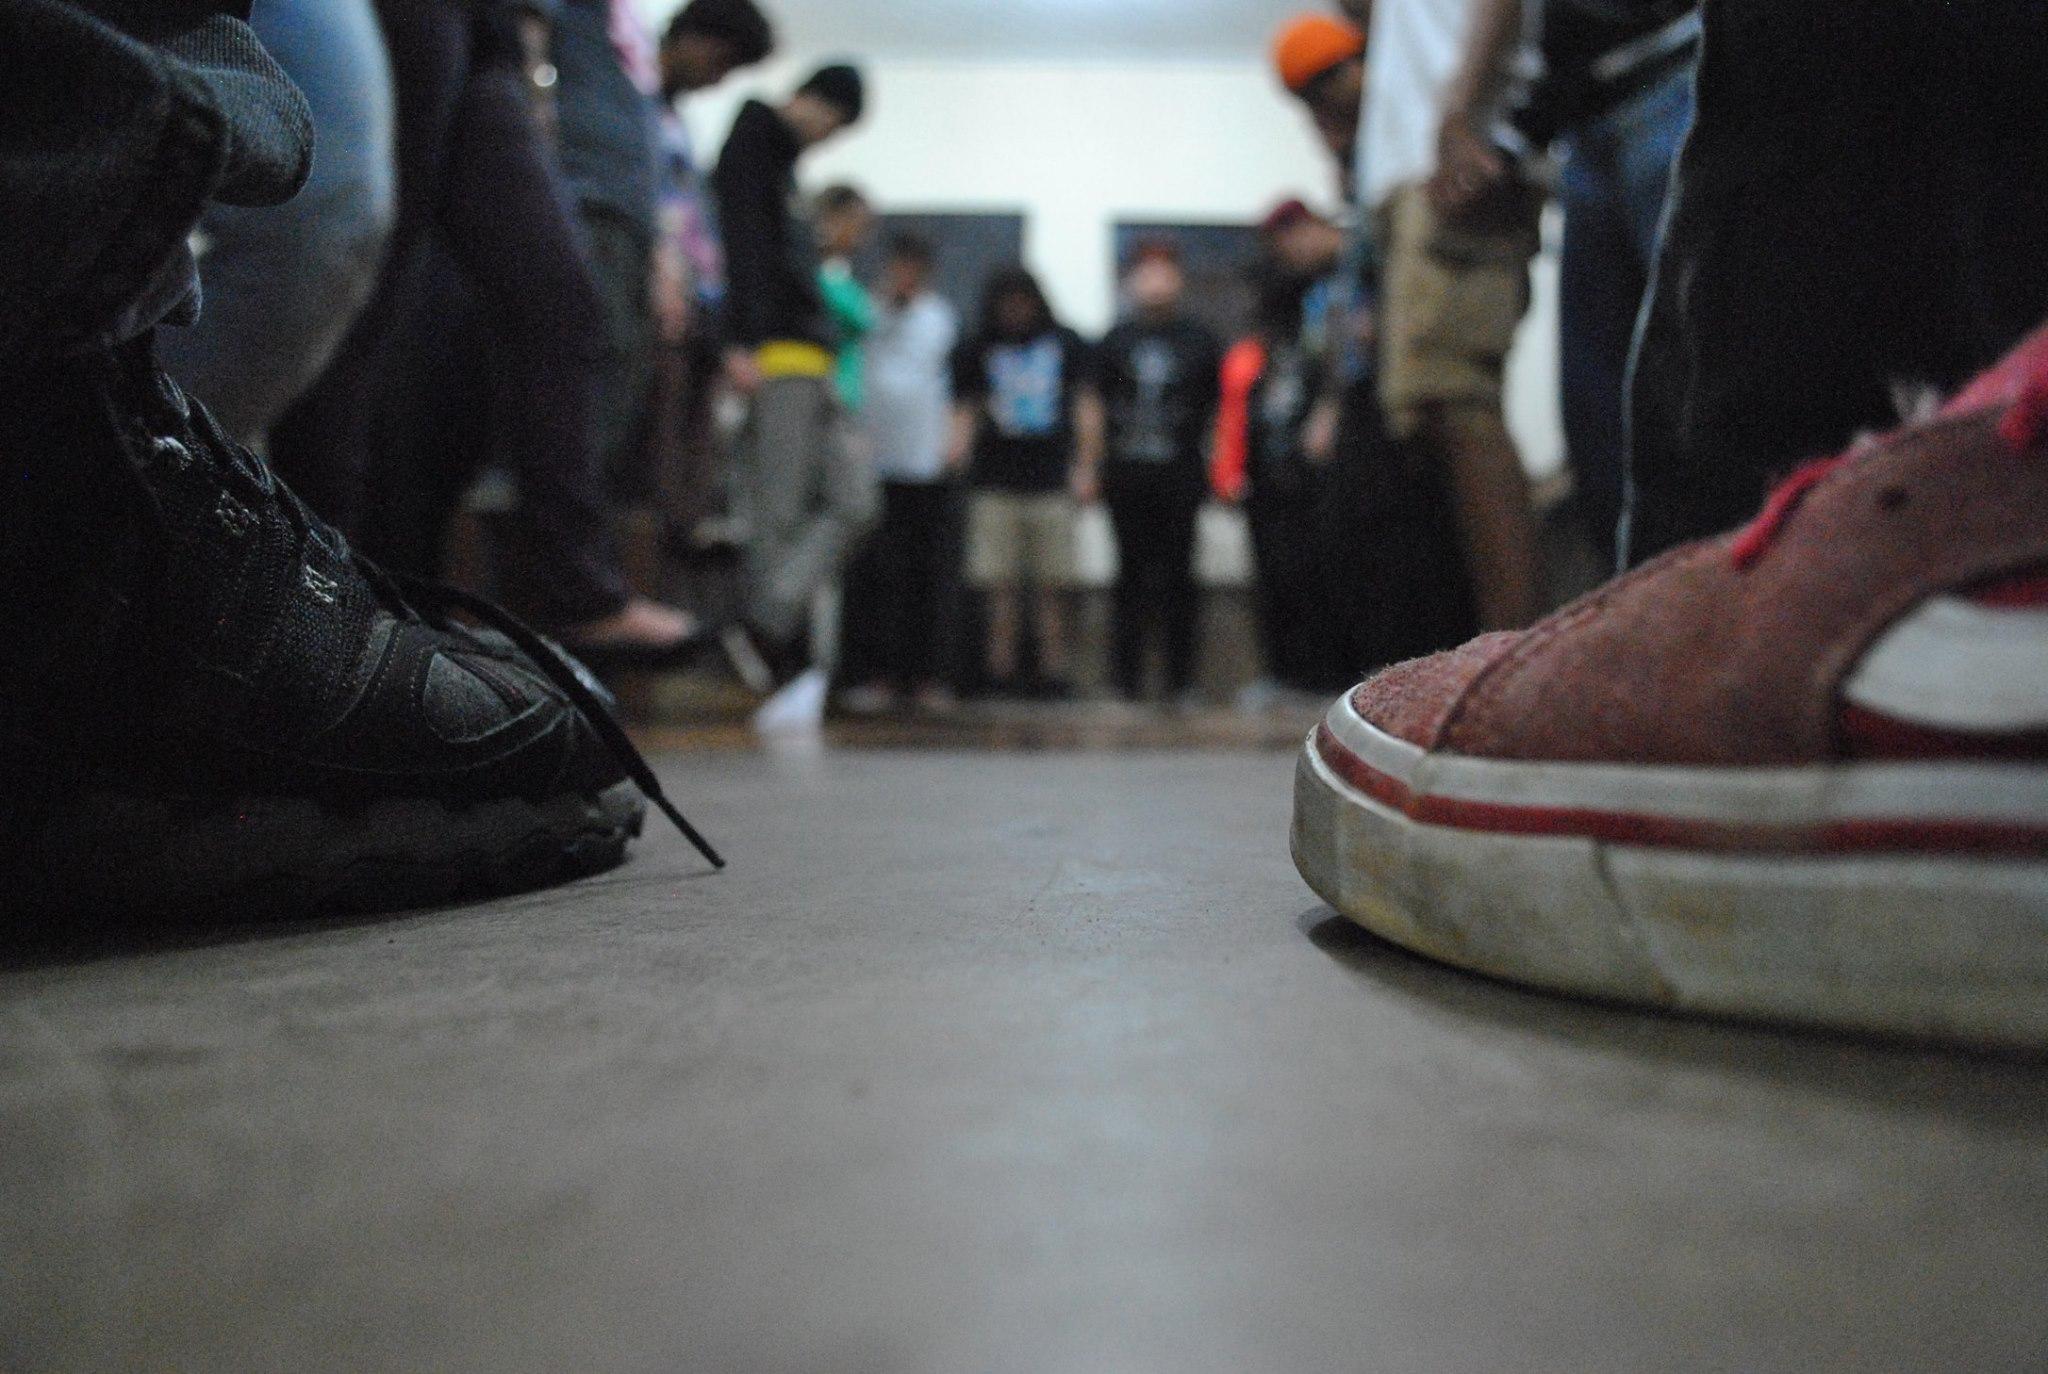 SkateHouseBibleStudy